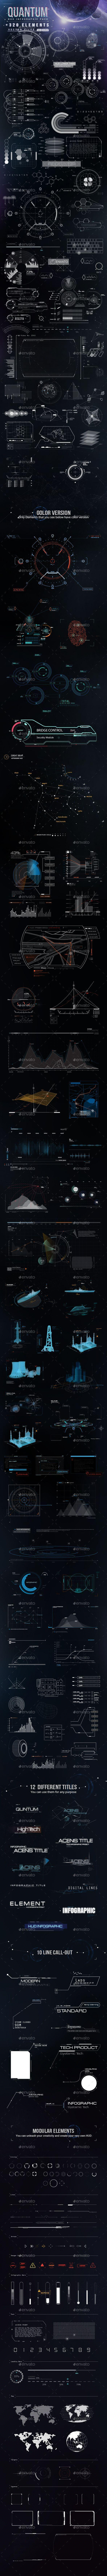 #VR #VRGames #Drone #Gaming Quantum - HiTech HUD Creator Kit - Infographics... Creator, game design, google cardboard, HiTech, hud, infographics, kit, Quantum, virtual reality, vr 360, vr games, vr glasses, vr gloves, vr headset, vr infographic, VR Pics, vr real estate #Creator #Game-Design #Google-Cardboard #HiTech #Hud #Infographics #Kit #Quantum #Virtual-Reality #Vr-360 #Vr-Games #Vr-Glasses #Vr-Gloves #Vr-Headset #Vr-Infographic #VR-Pics #Vr-Real-Estate http://bit.ly/2